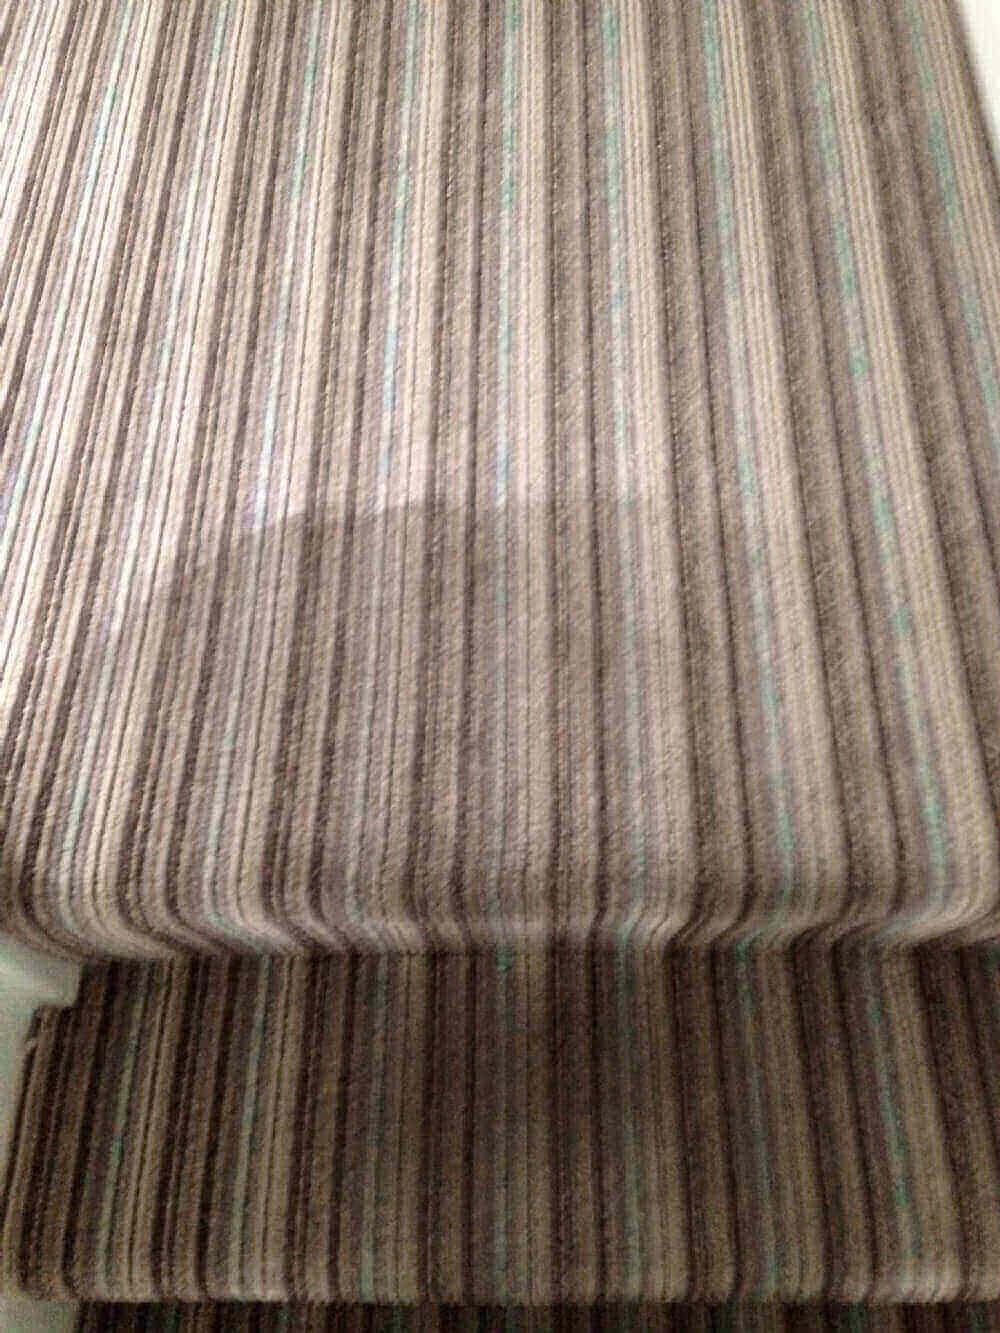 Domestic Cleaners Leamington Spa